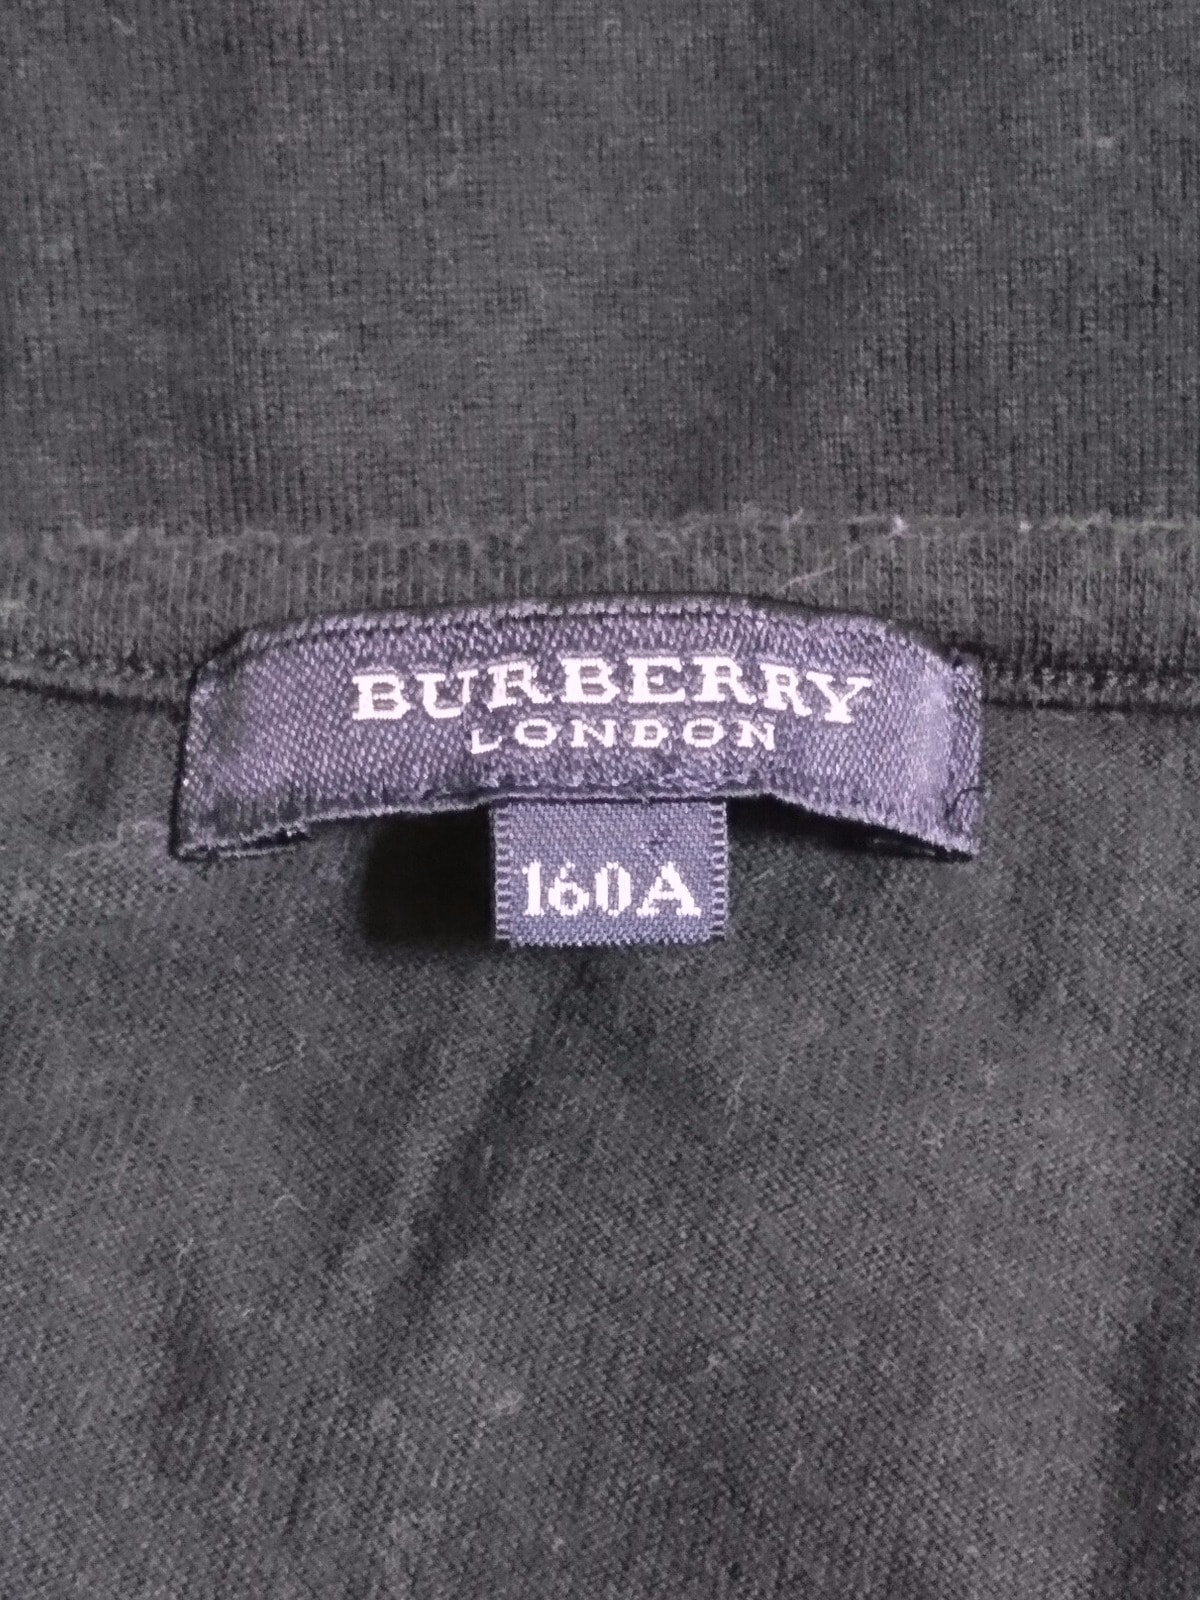 Burberry LONDON(バーバリーロンドン)のキャミソール